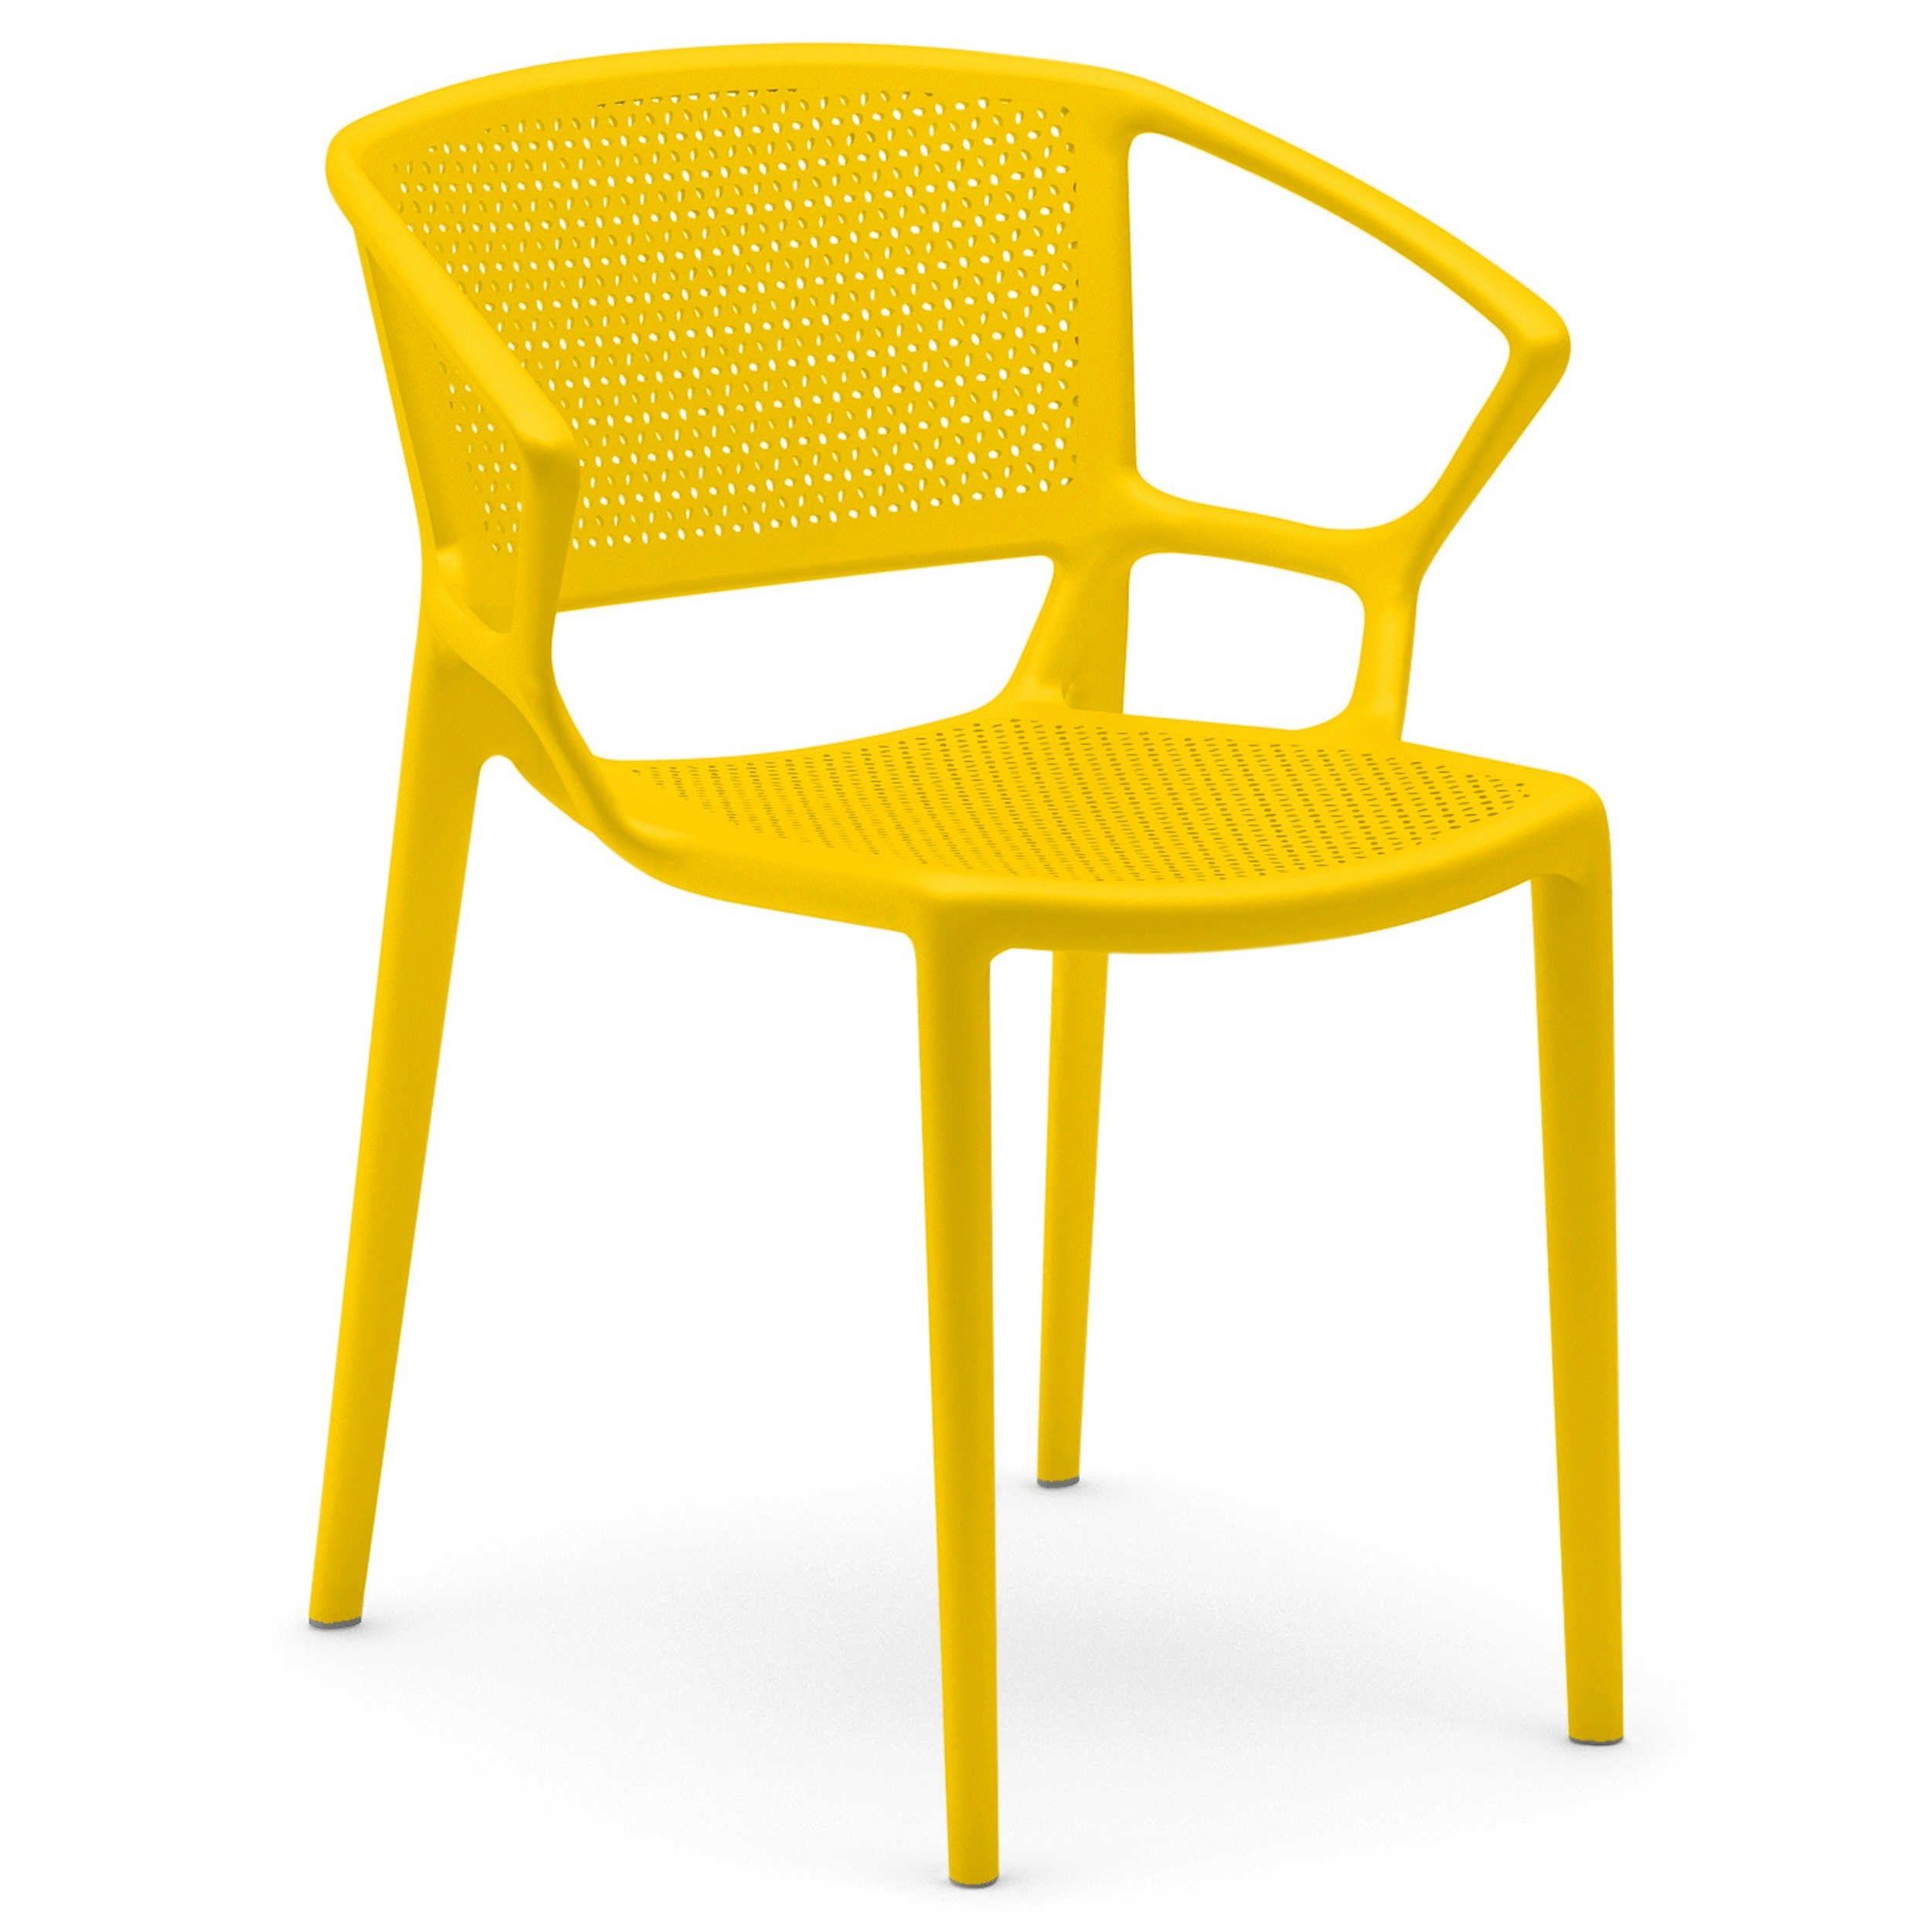 Infiniti Stuhl Fiorellina 2er Set Verschiedene Farben 4 Fuss Stuhle Stuhle Freischwinger Esszimmer Mobel Esszimmer Mobel